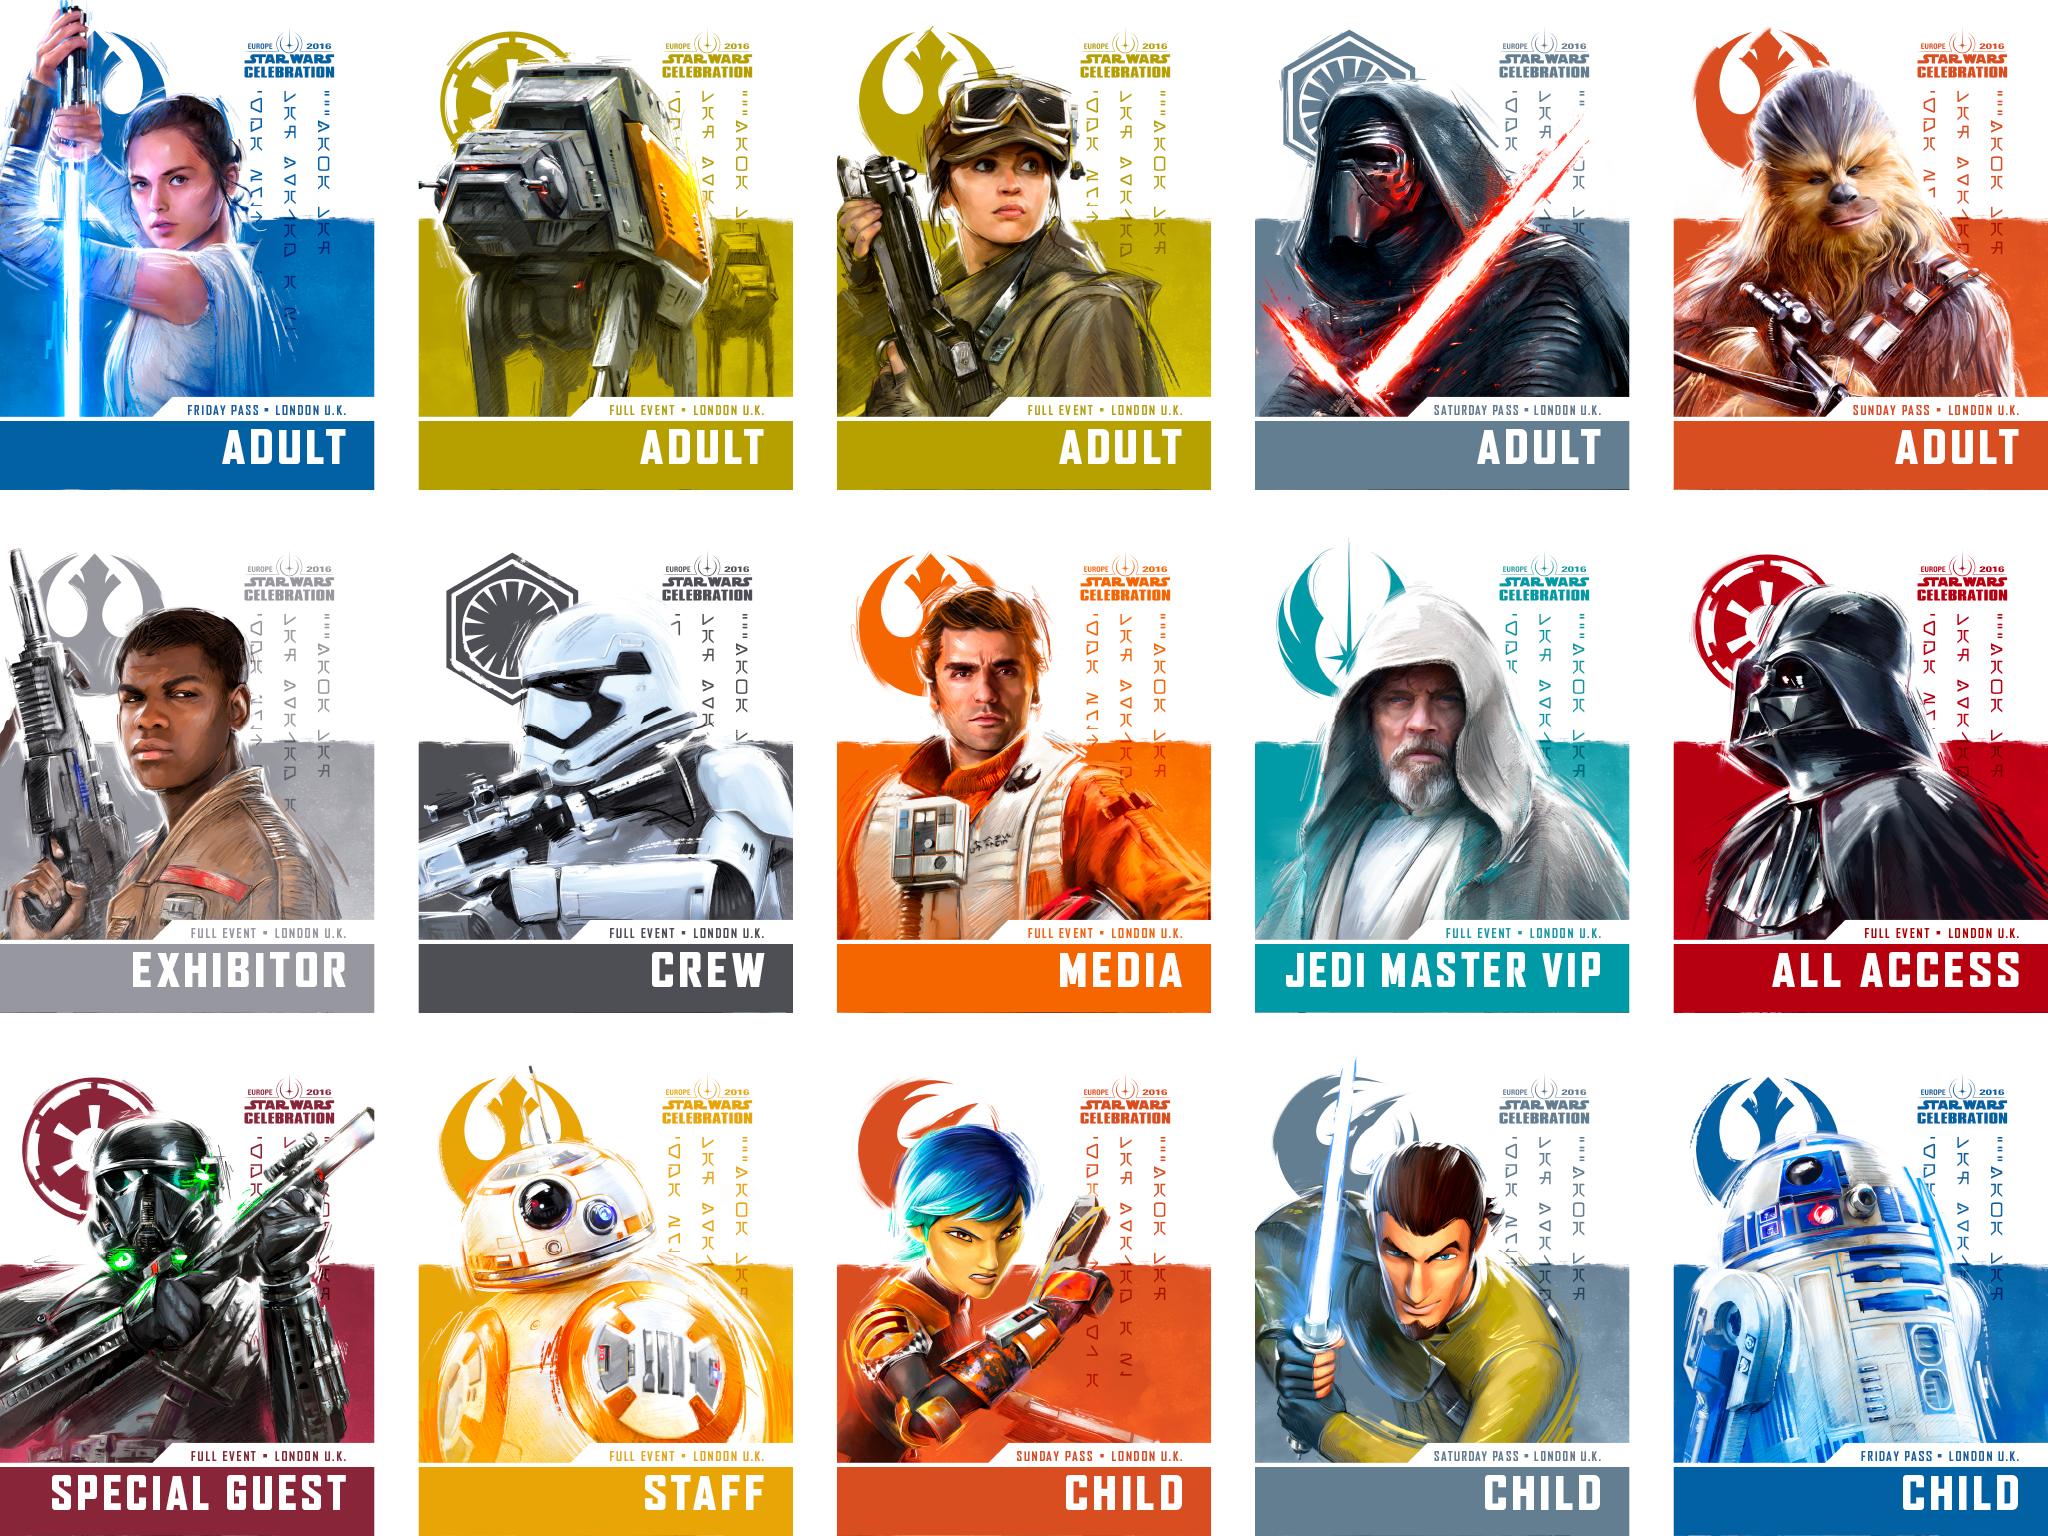 PLT_Star_Wars_Celebration3.jpg